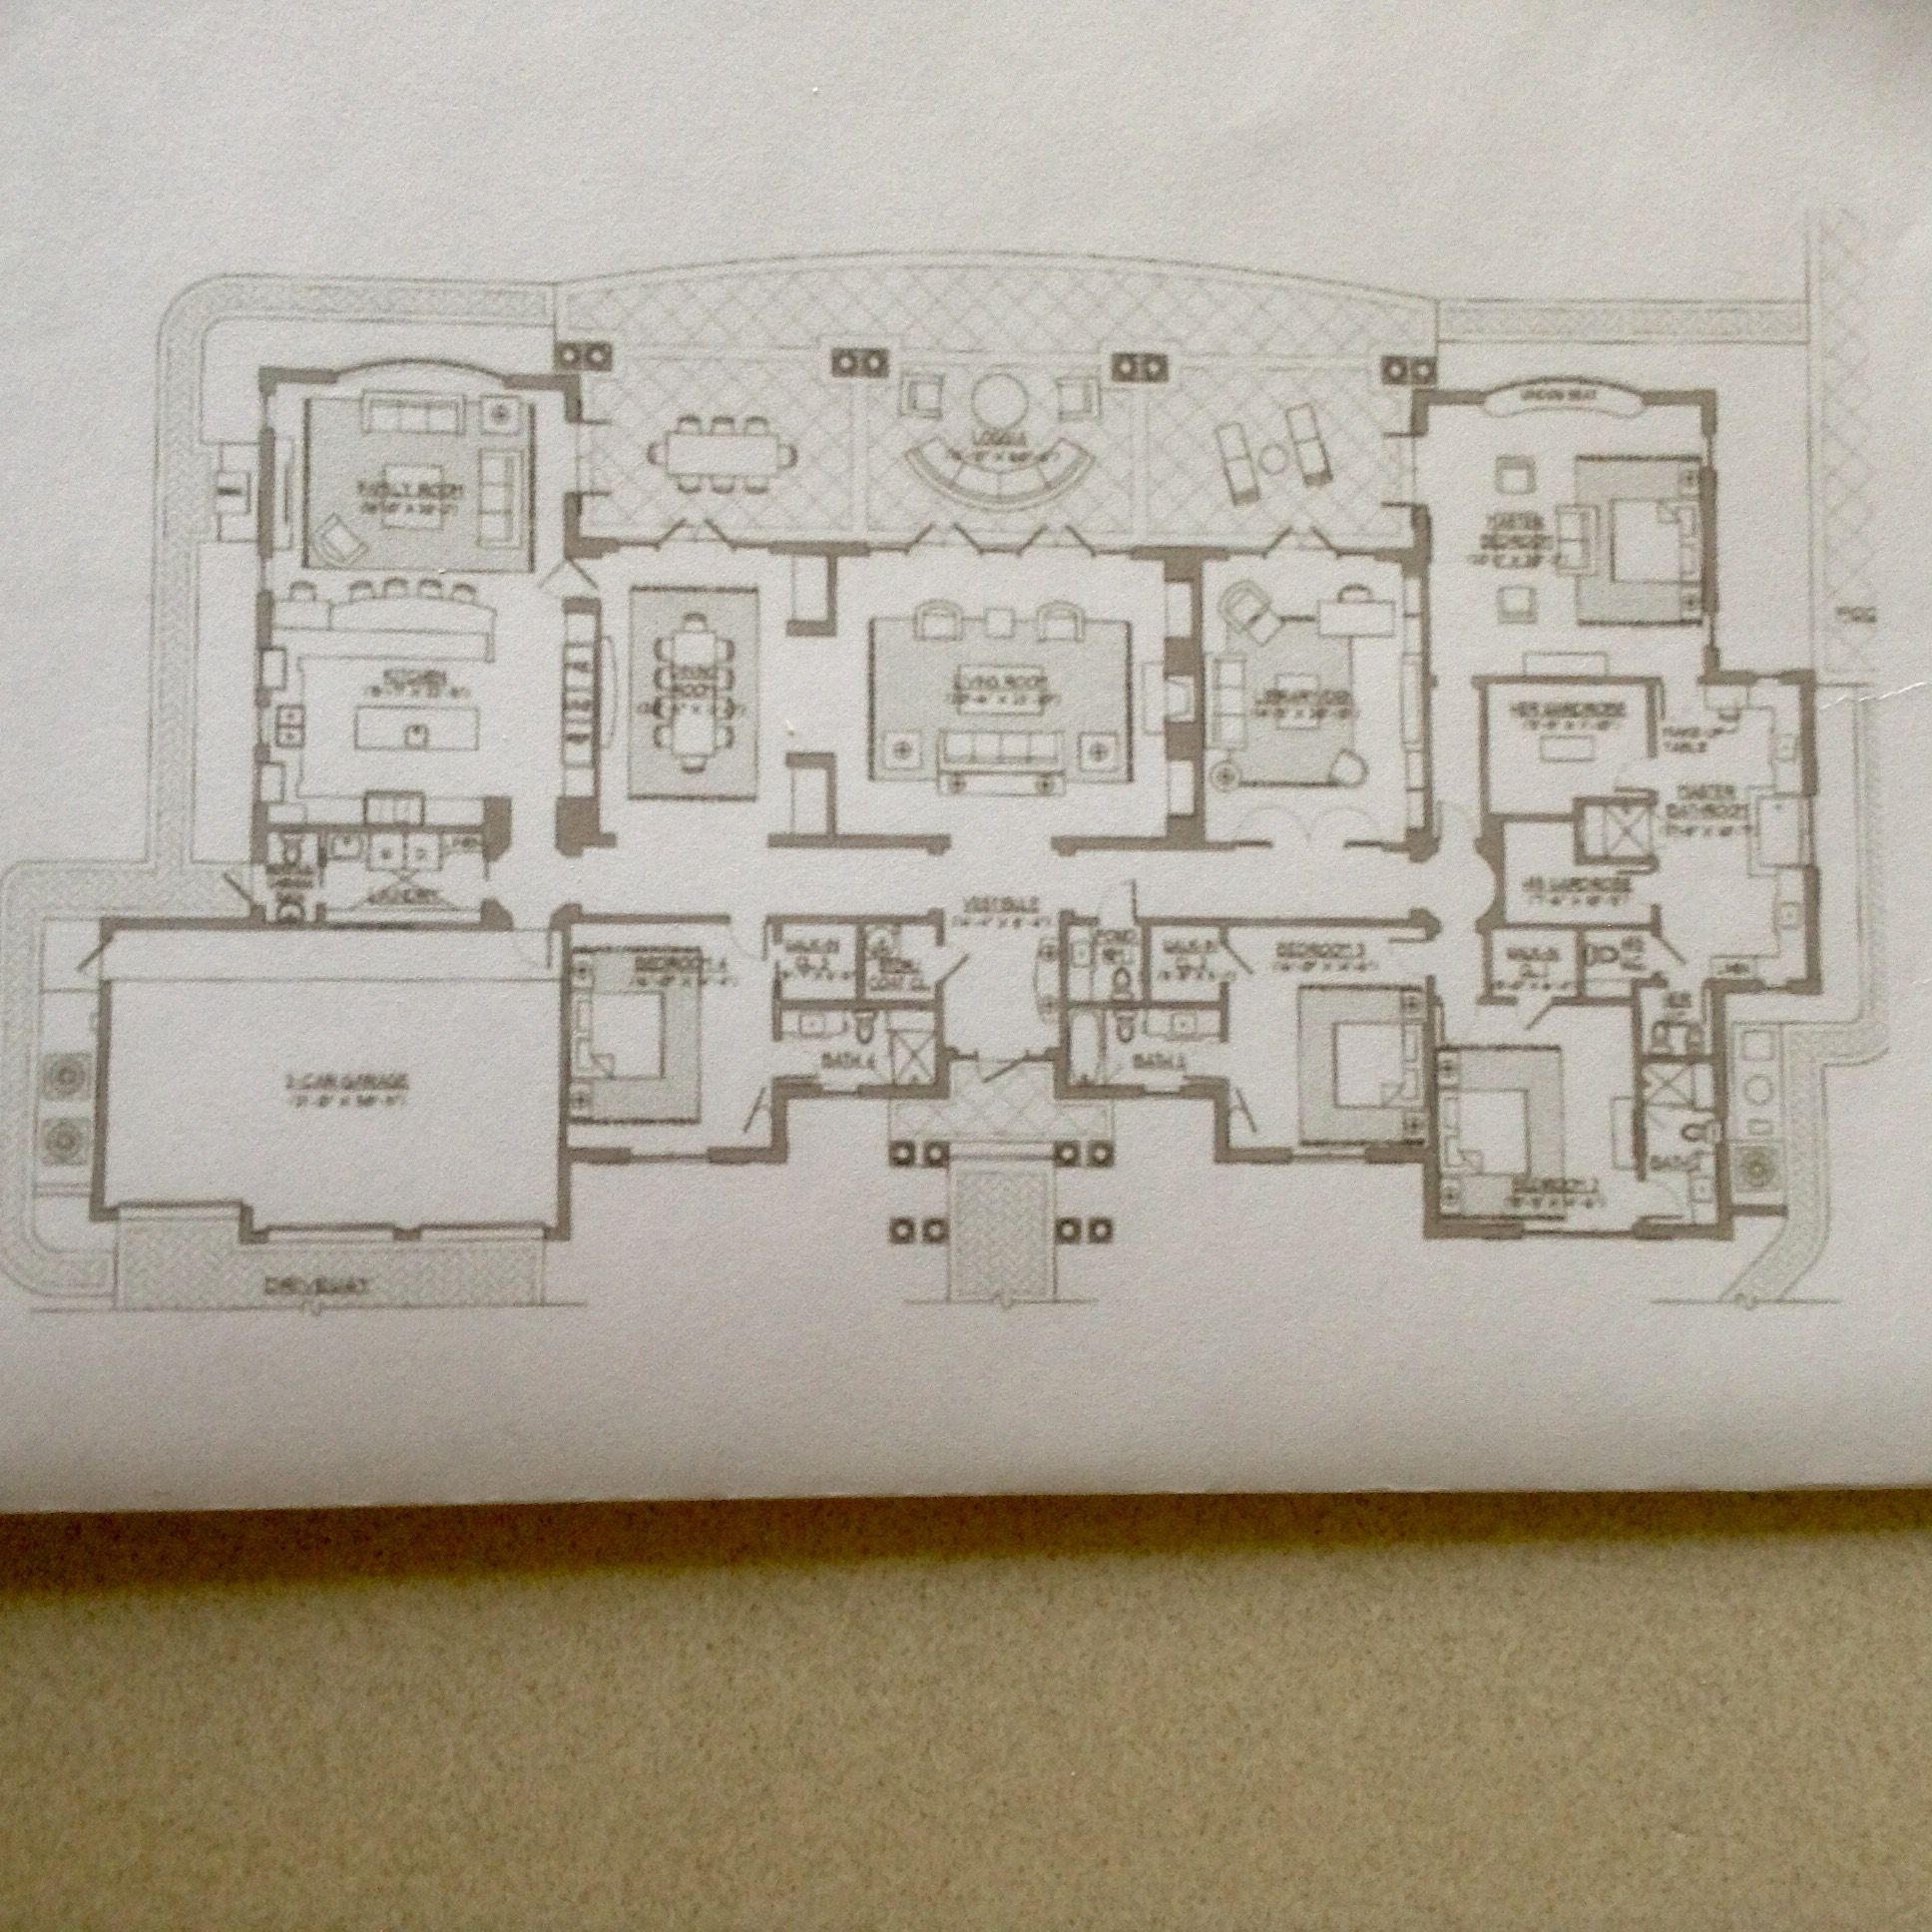 590 Home Floor Plans Ideas Floor Plans House Floor Plans How To Plan